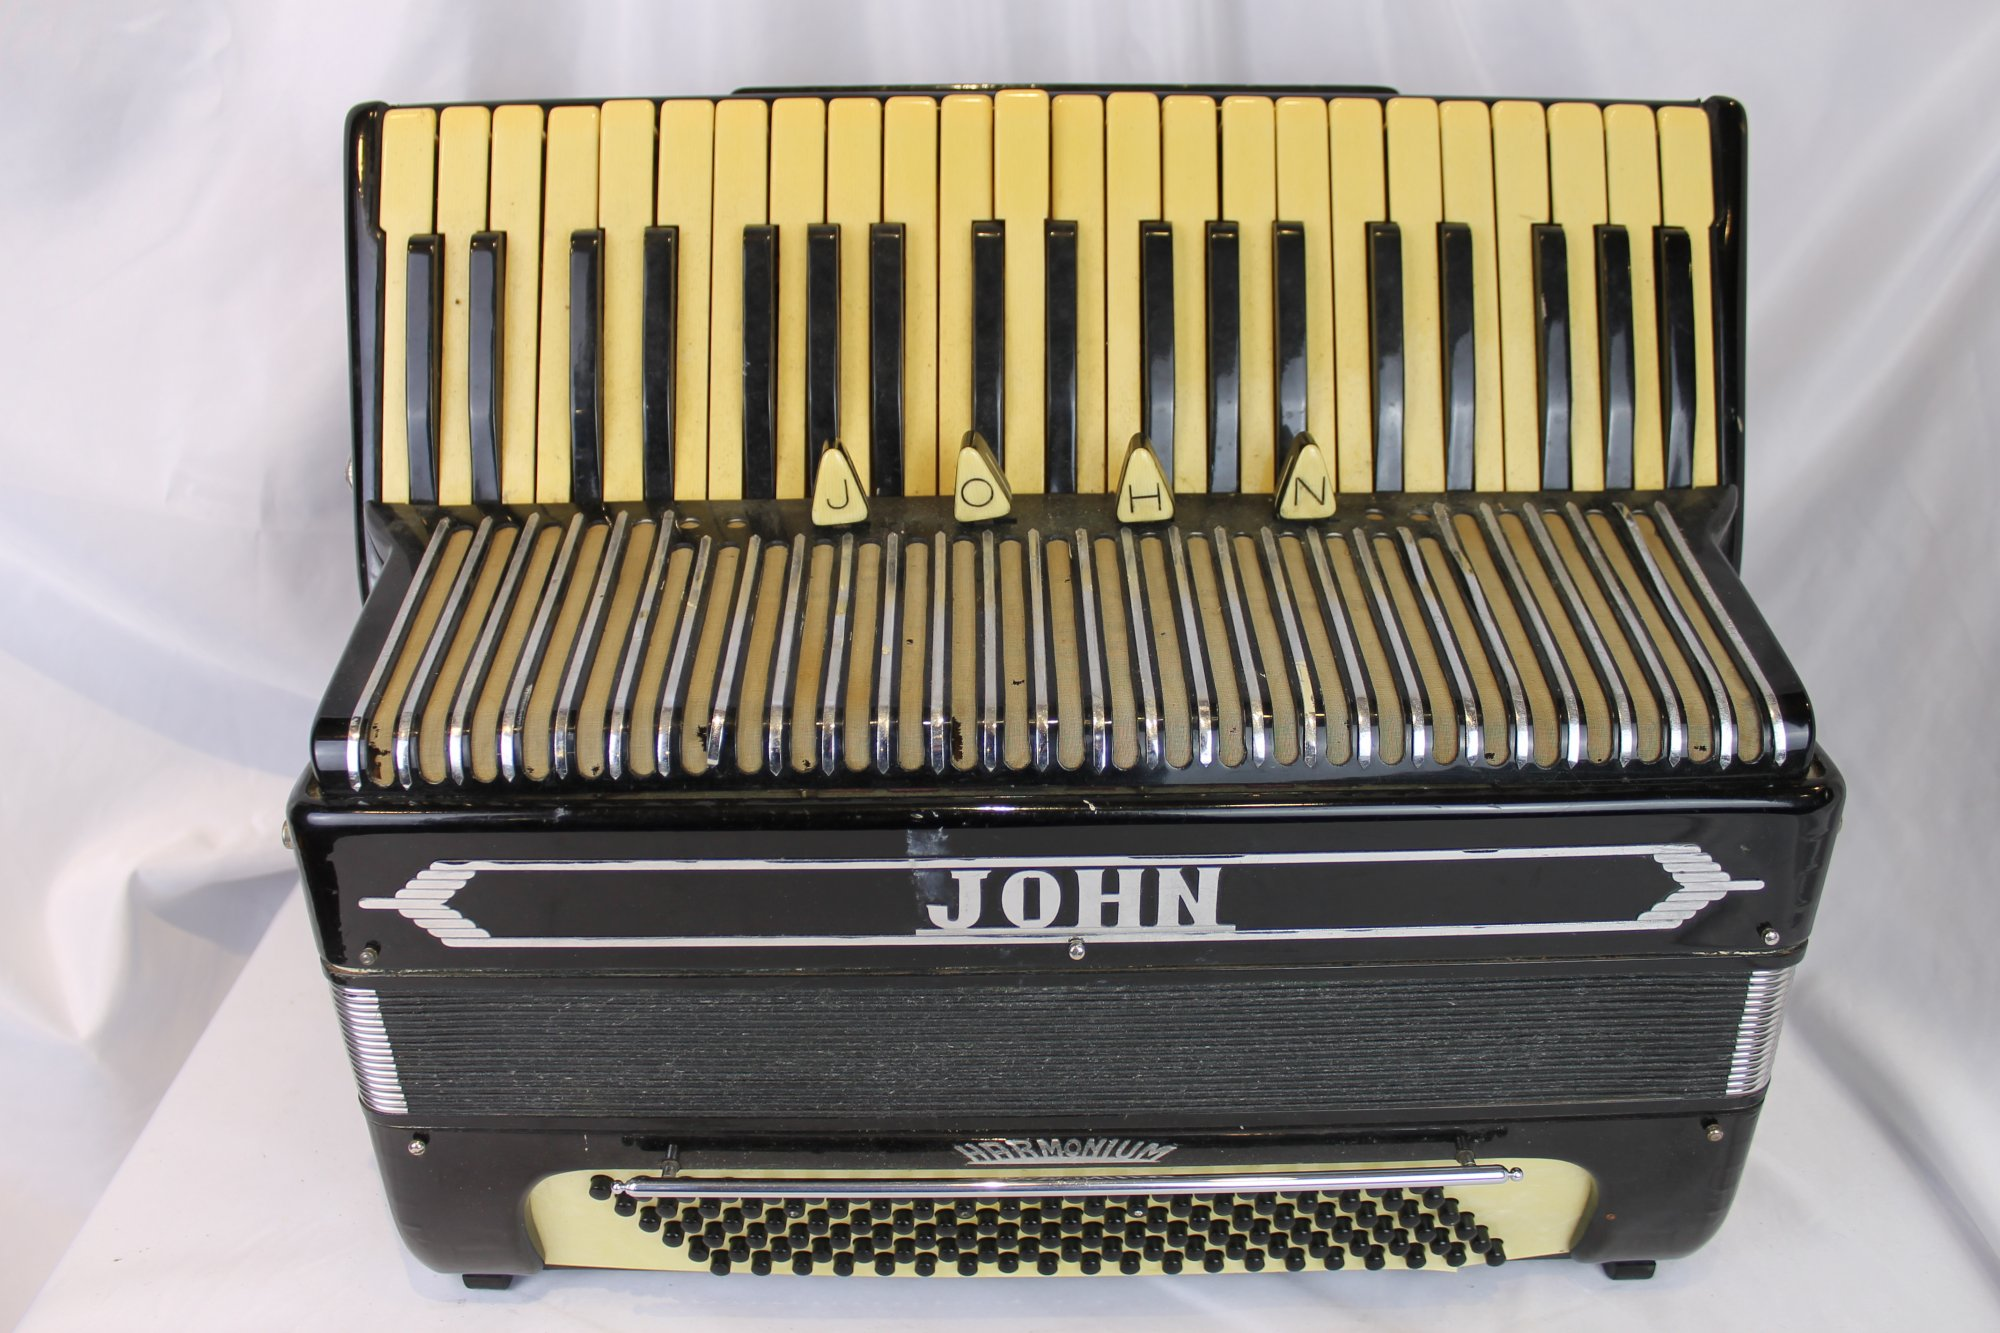 4532 - Black Harmonium John Piano Accordion LMMH 41 120 - For Parts or Repair